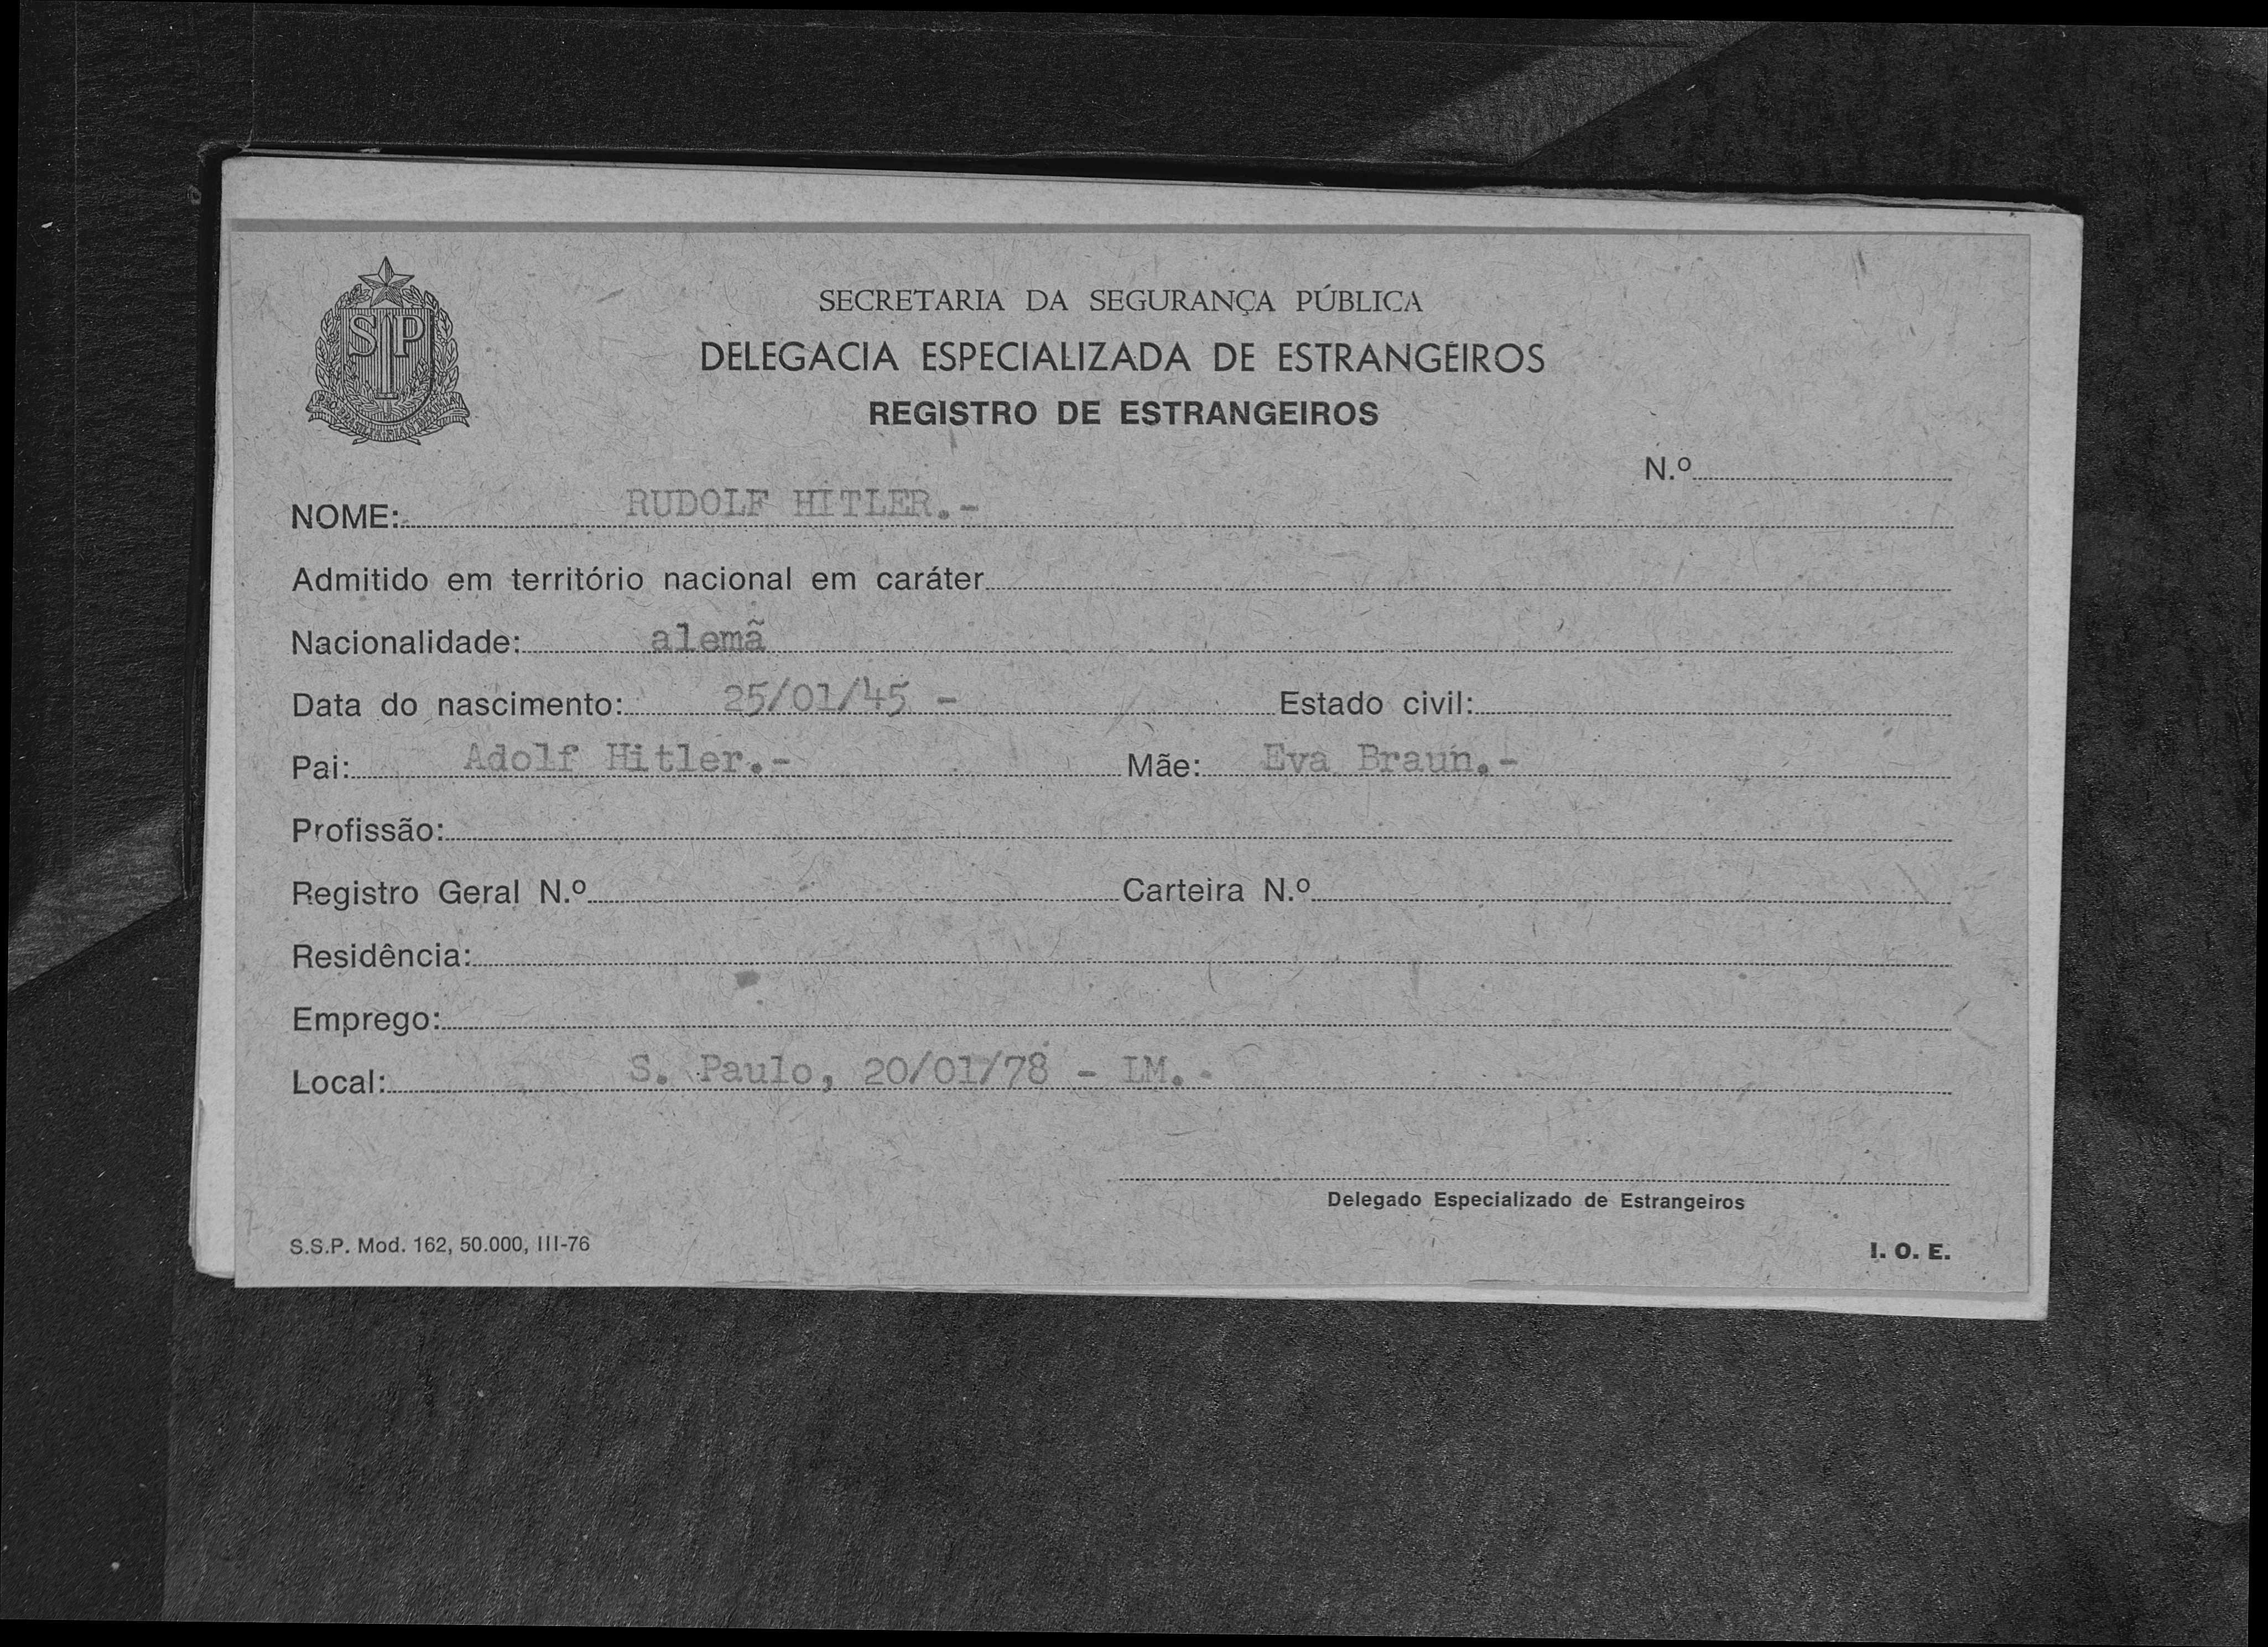 Rudolf Hitler Immigration 1978 São Paulo, São Paulo, Brazil  Germany 25 Jan 1945  Adolf Hitler Eva Braun